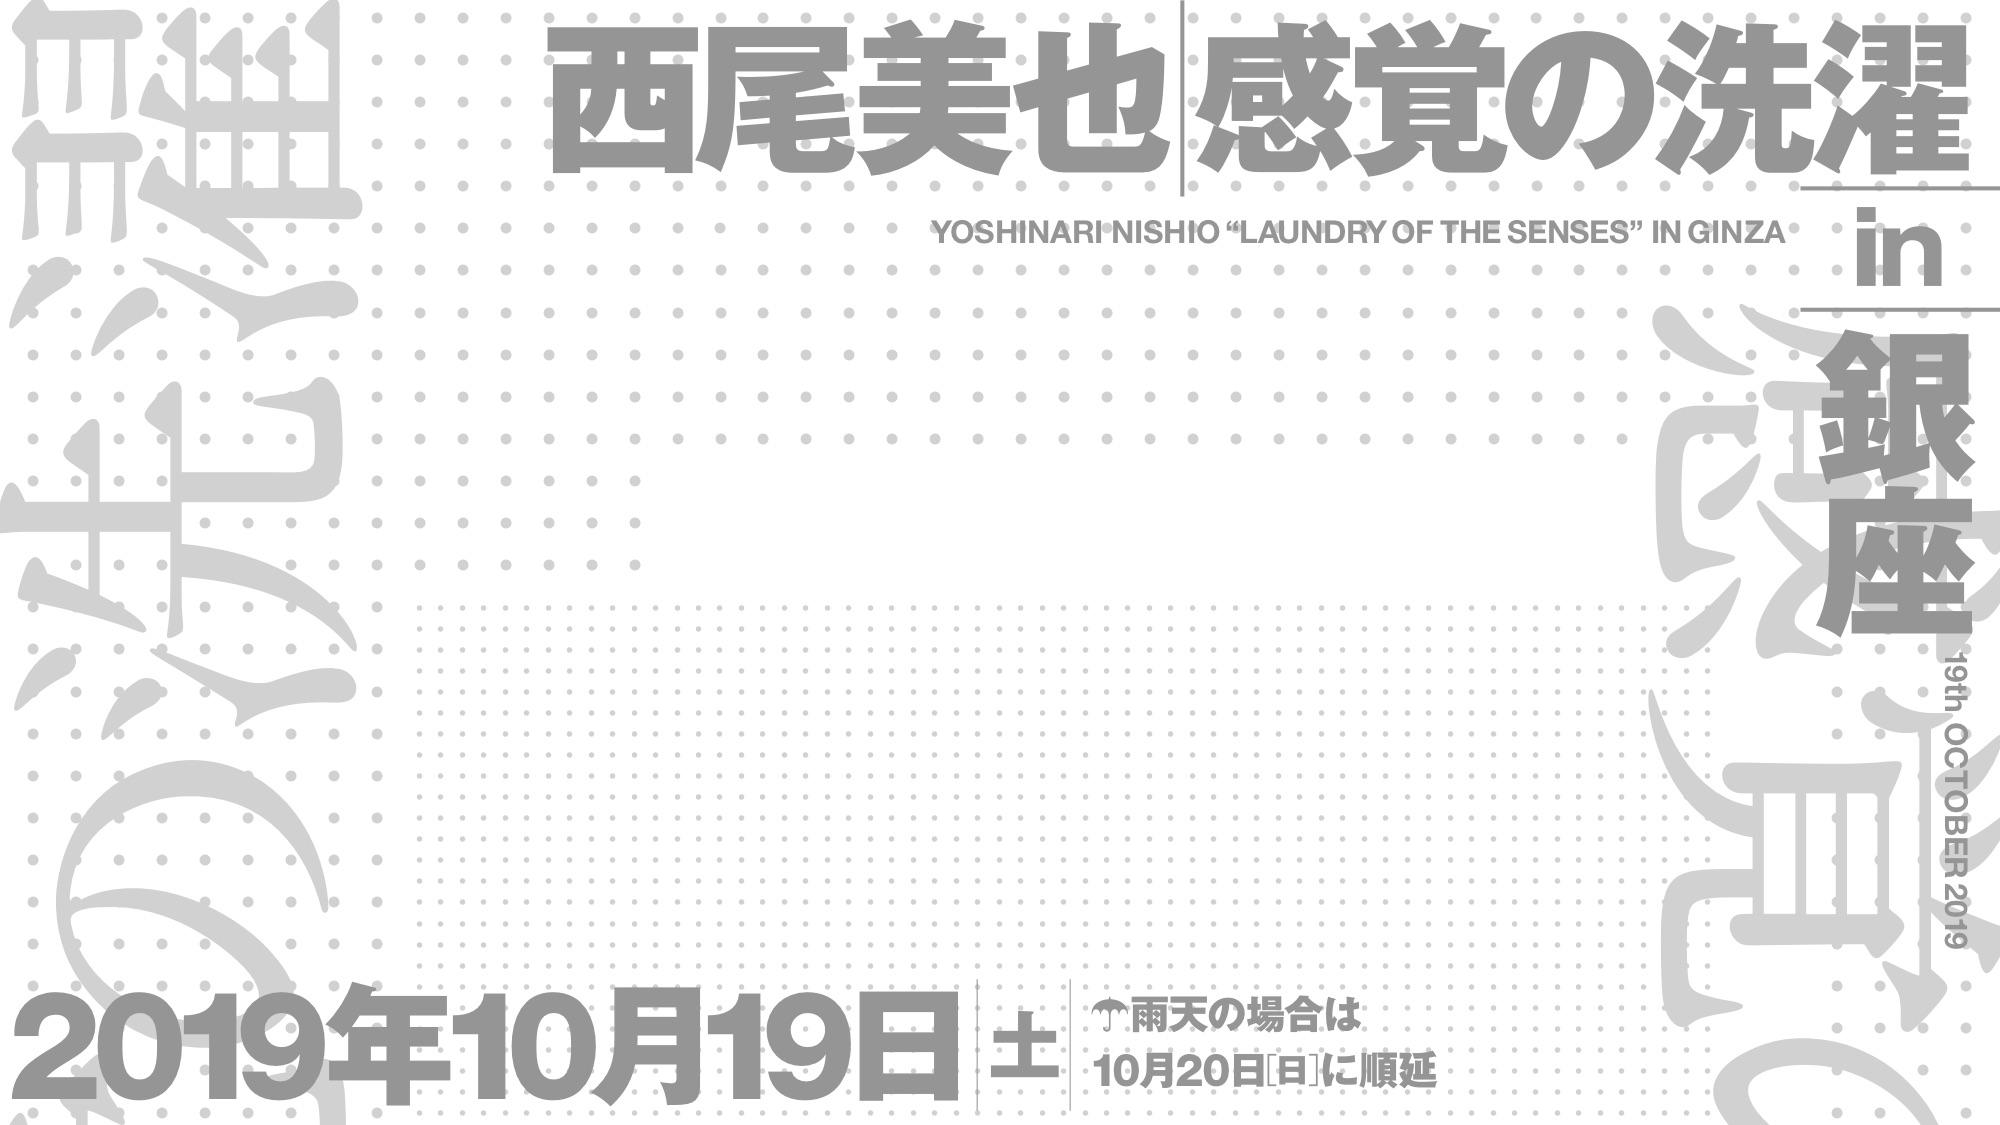 (jp) 感覚の洗濯 in 銀座